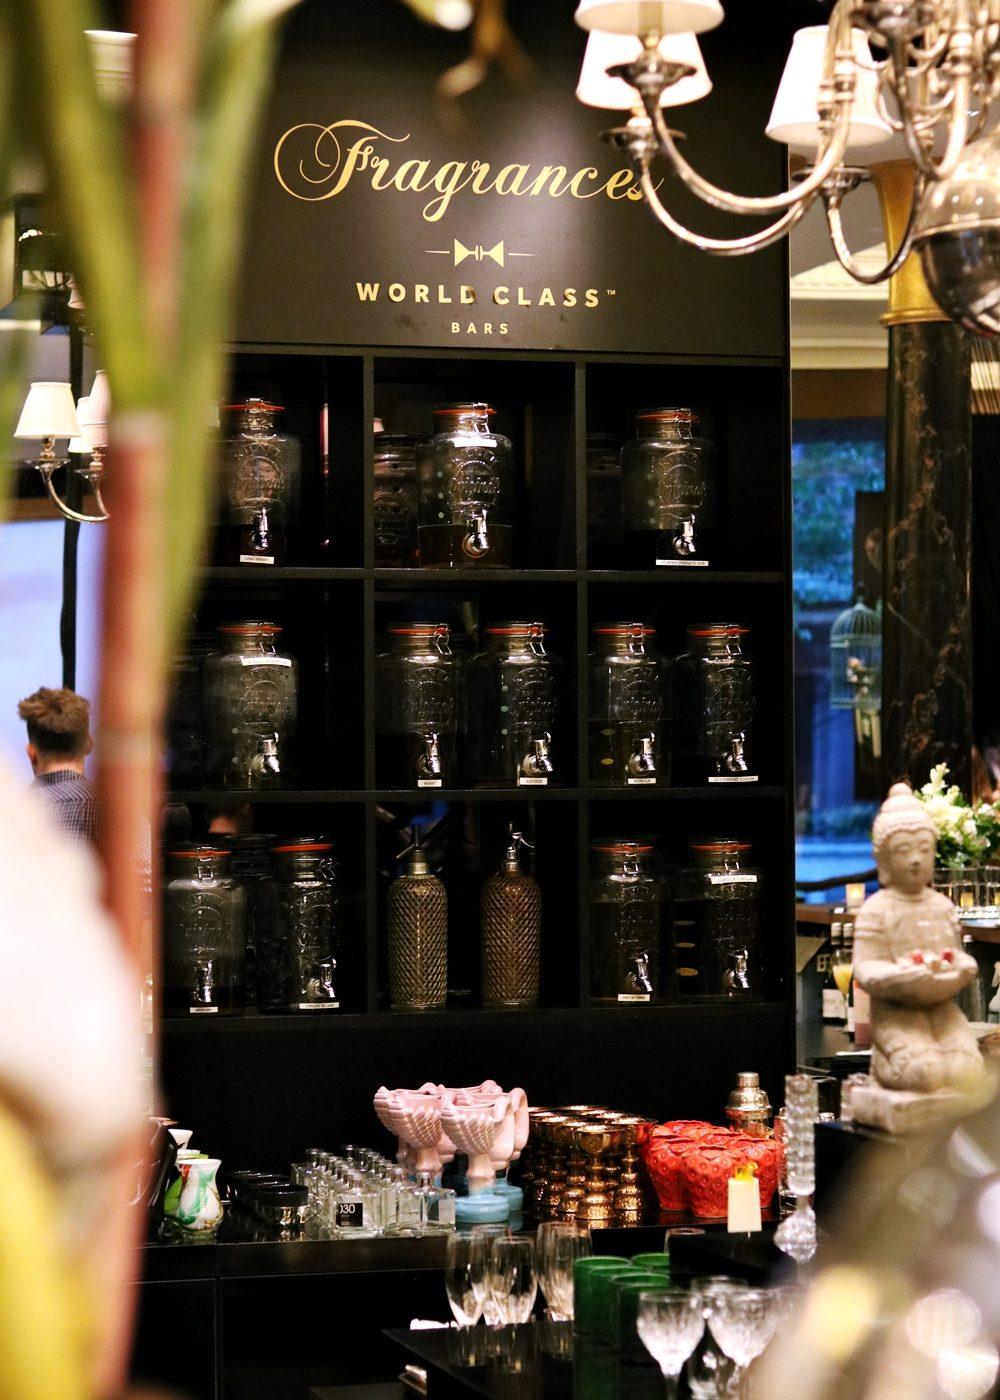 fragrances-bar-ritz-carlton-hotel-berlin-2